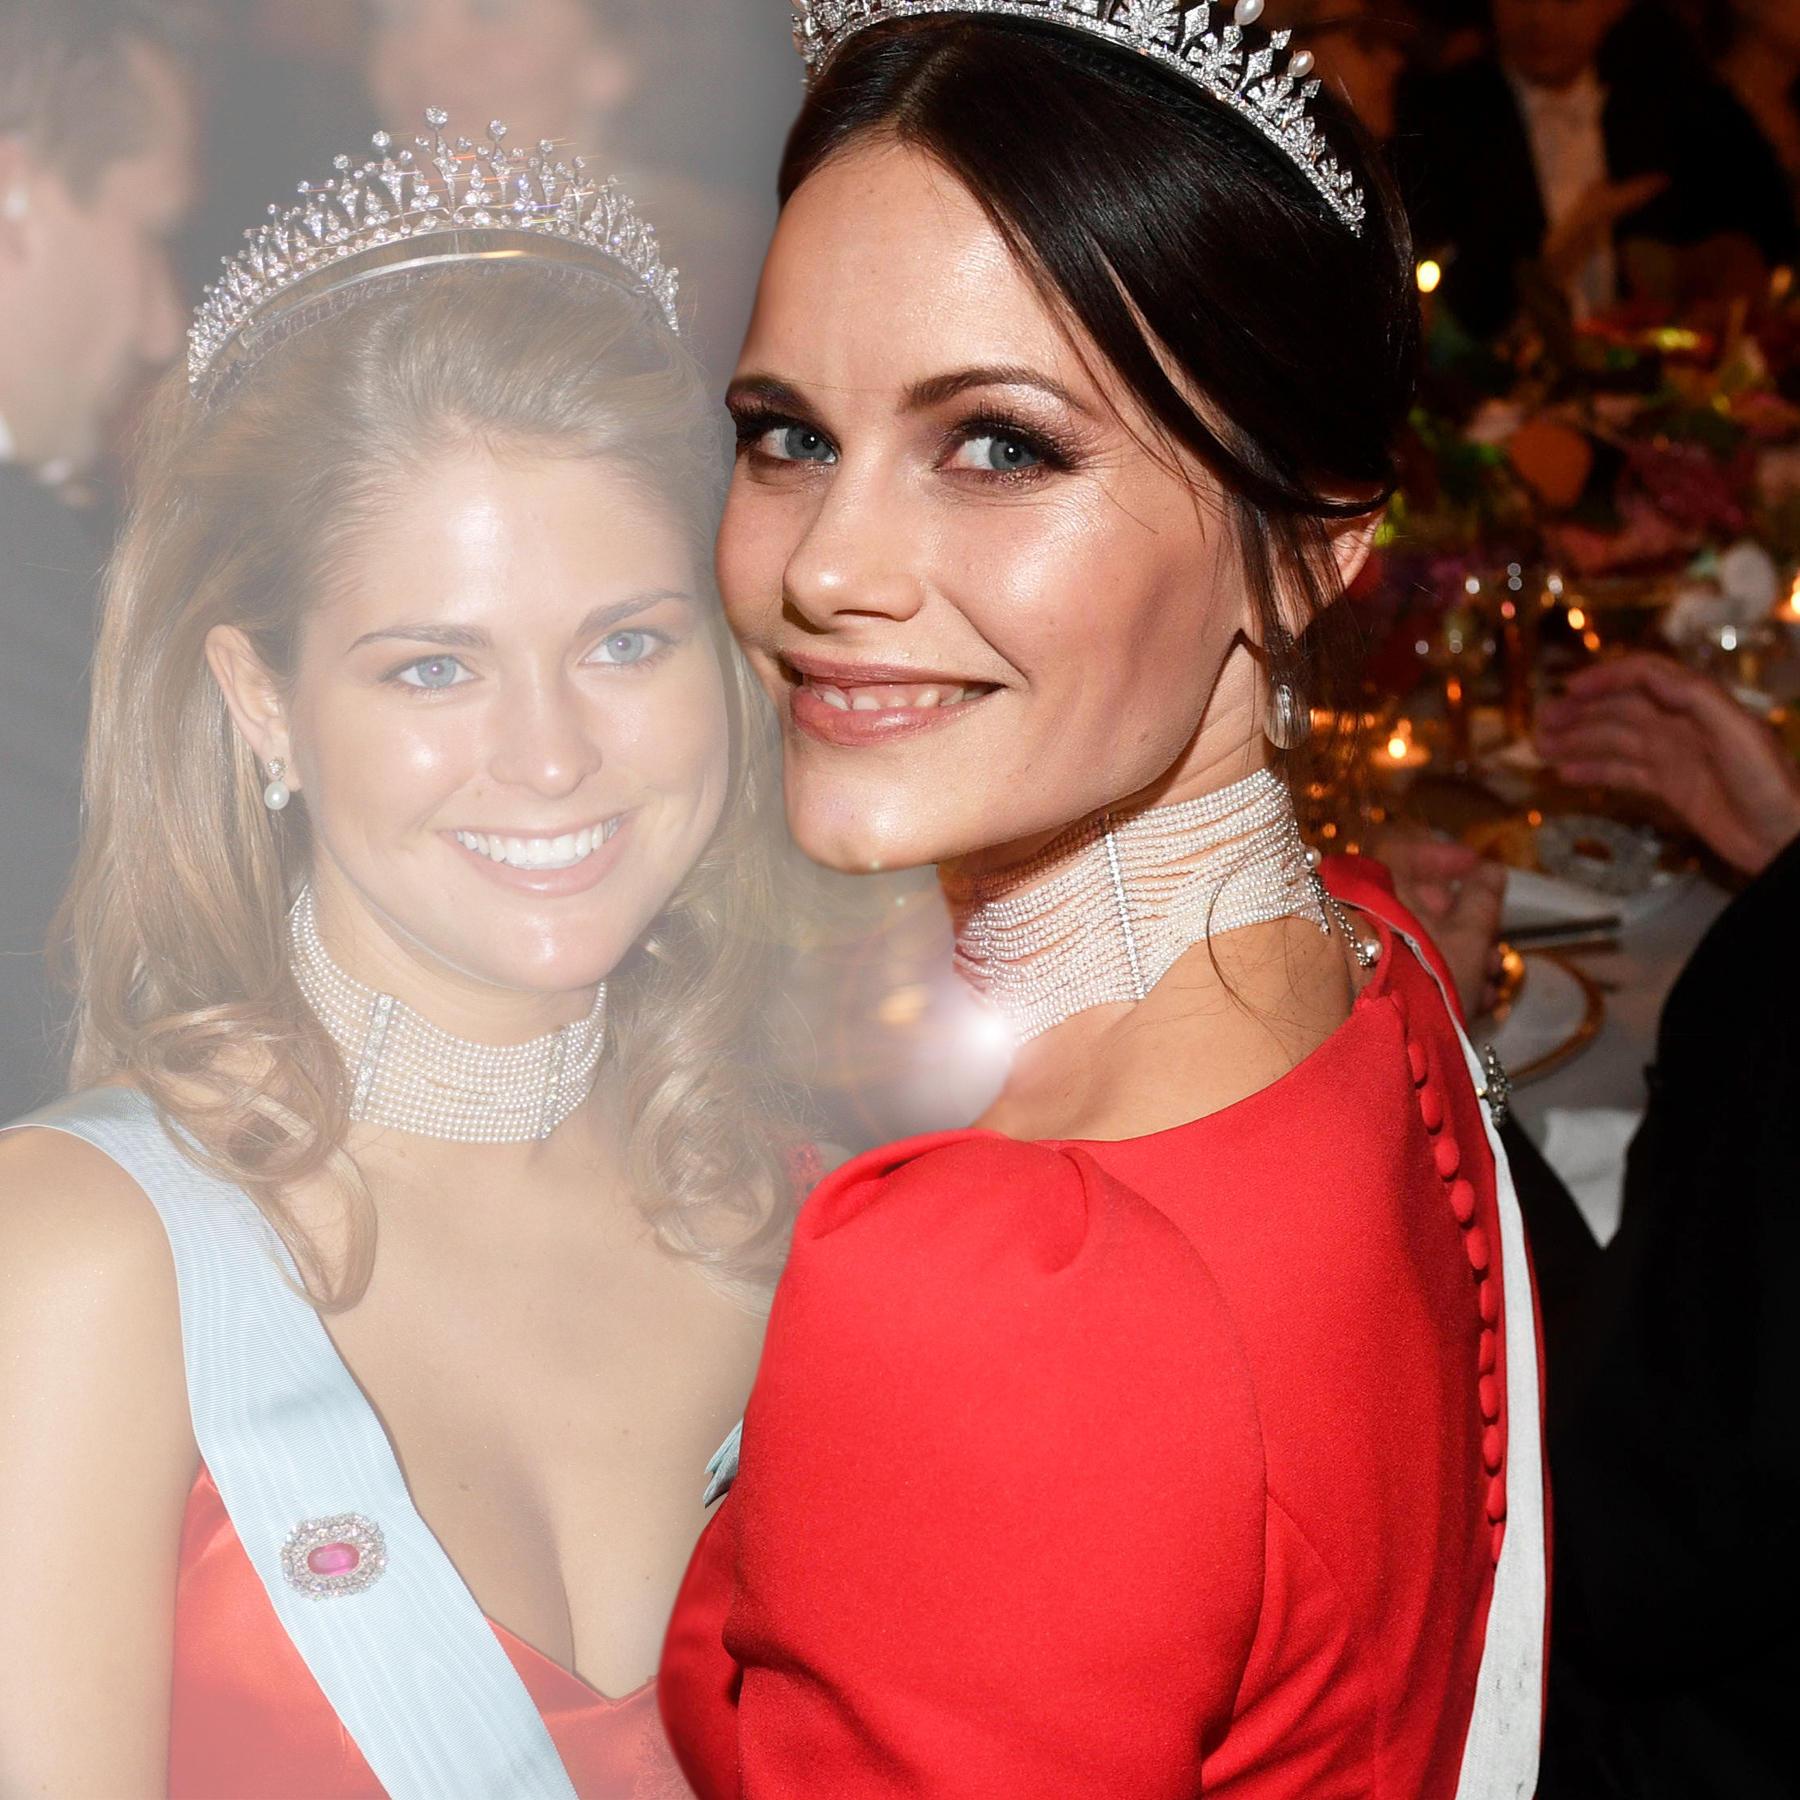 Prinzessin Sofia: Hommage An Prinzessin Madeleine | Gala.de